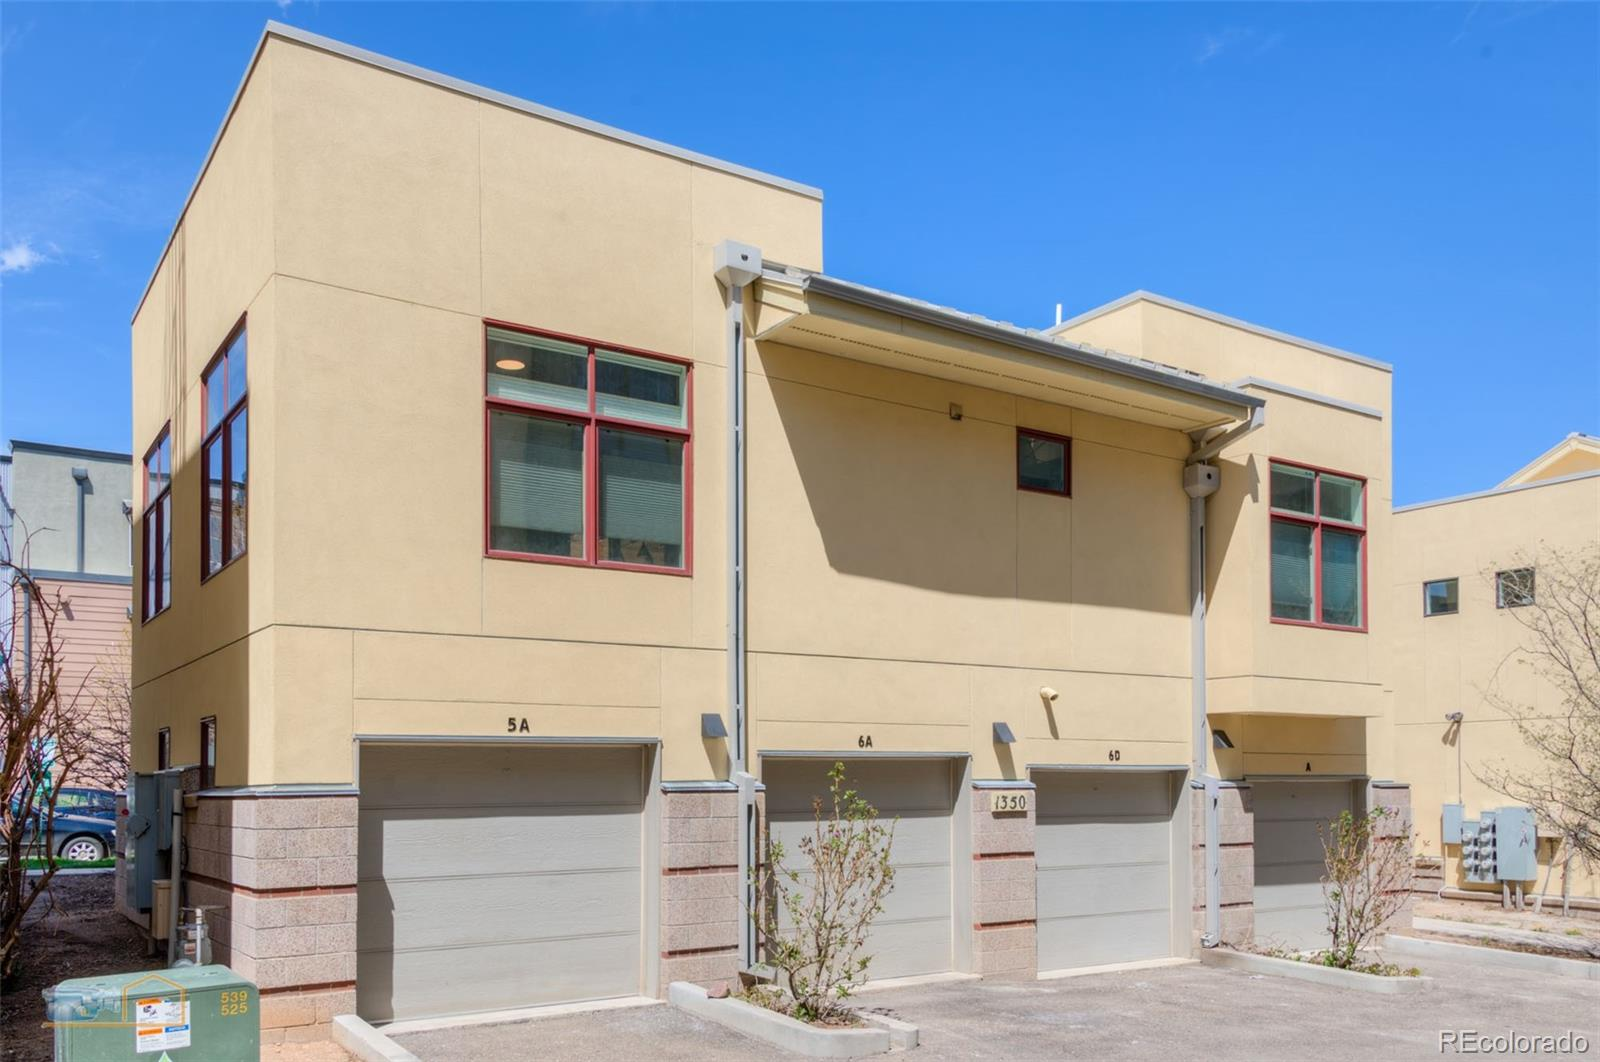 MLS# 8253378 - 23 - 1350 Rosewood Avenue, Boulder, CO 80304